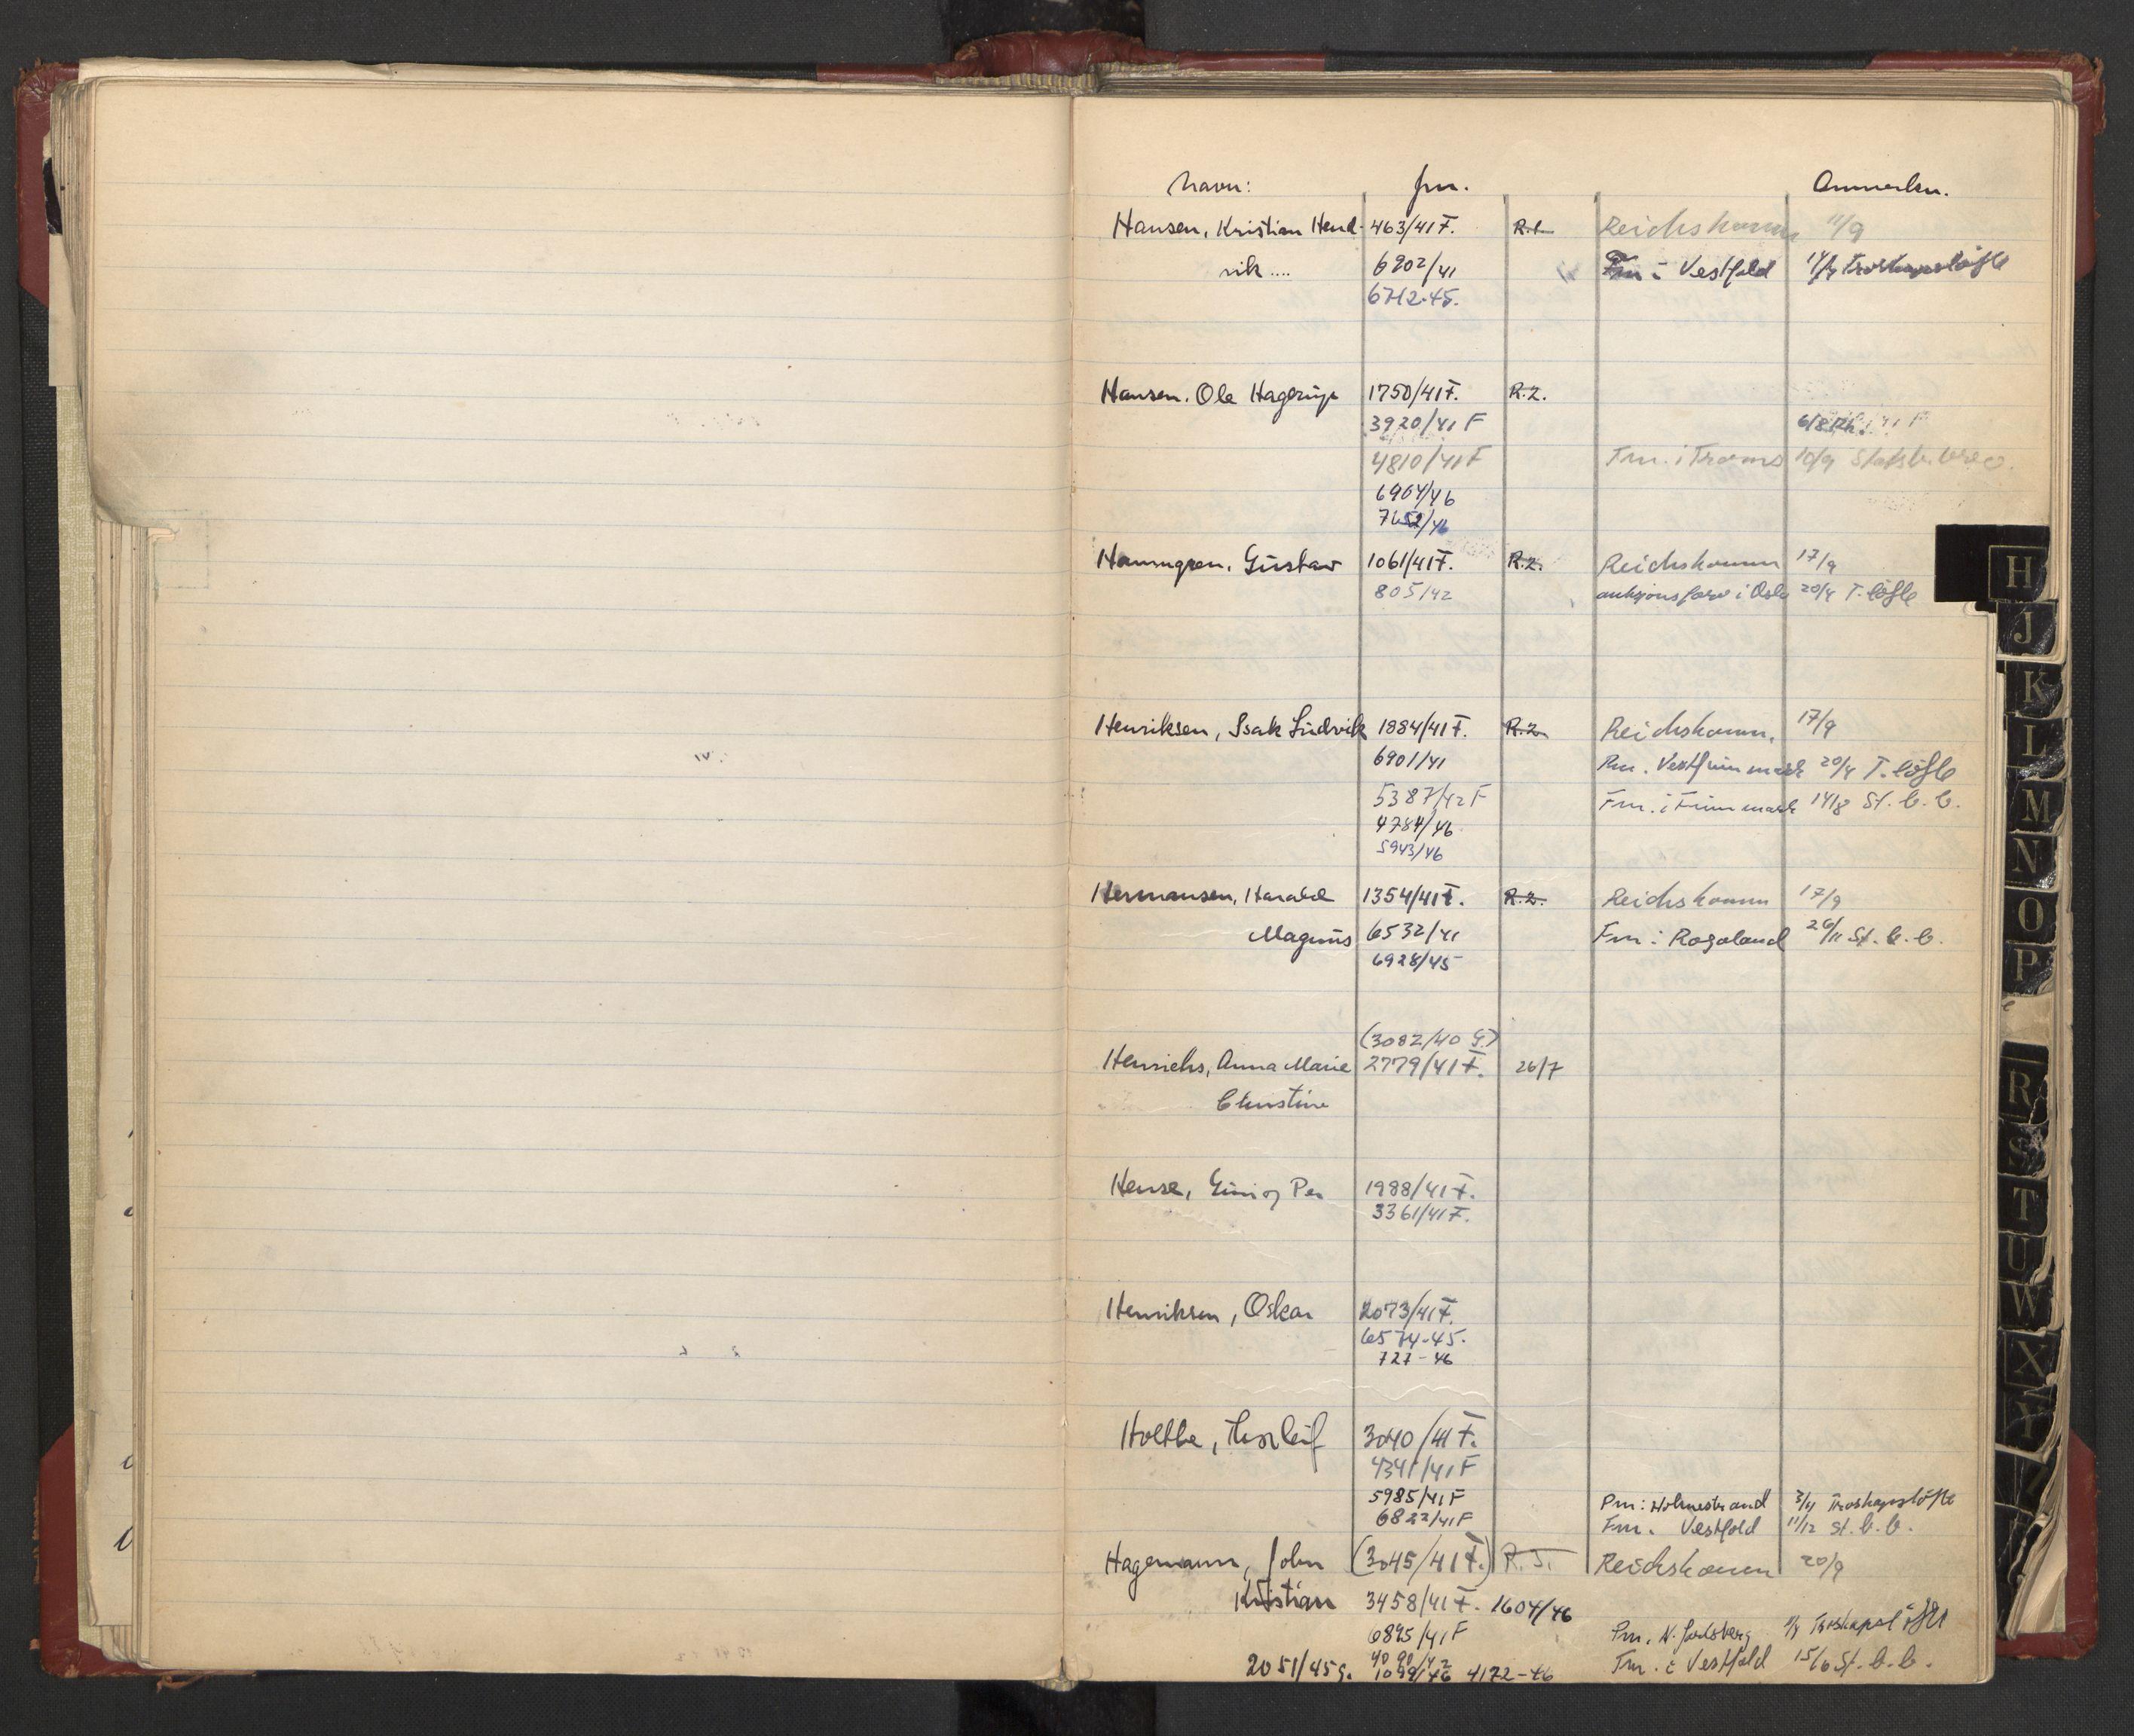 RA, Justisdepartementet, 3. politikontor P3, C/Cc/L0002: Journalregister over statsborgersaker, 1940-1946, s. 36